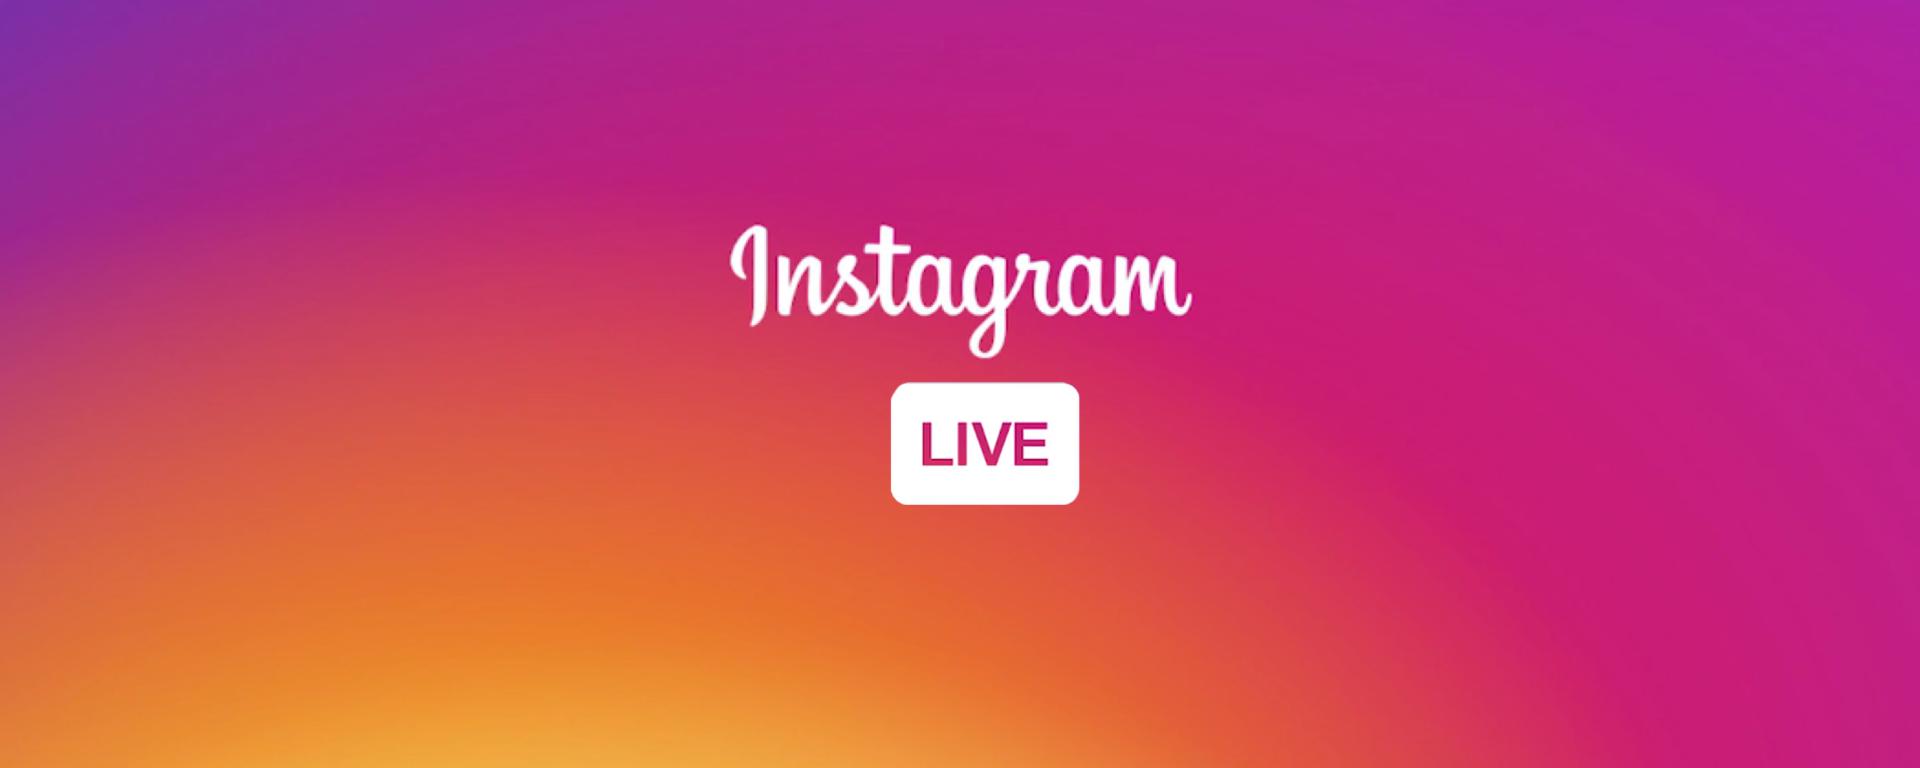 Instagram Live for musicians.